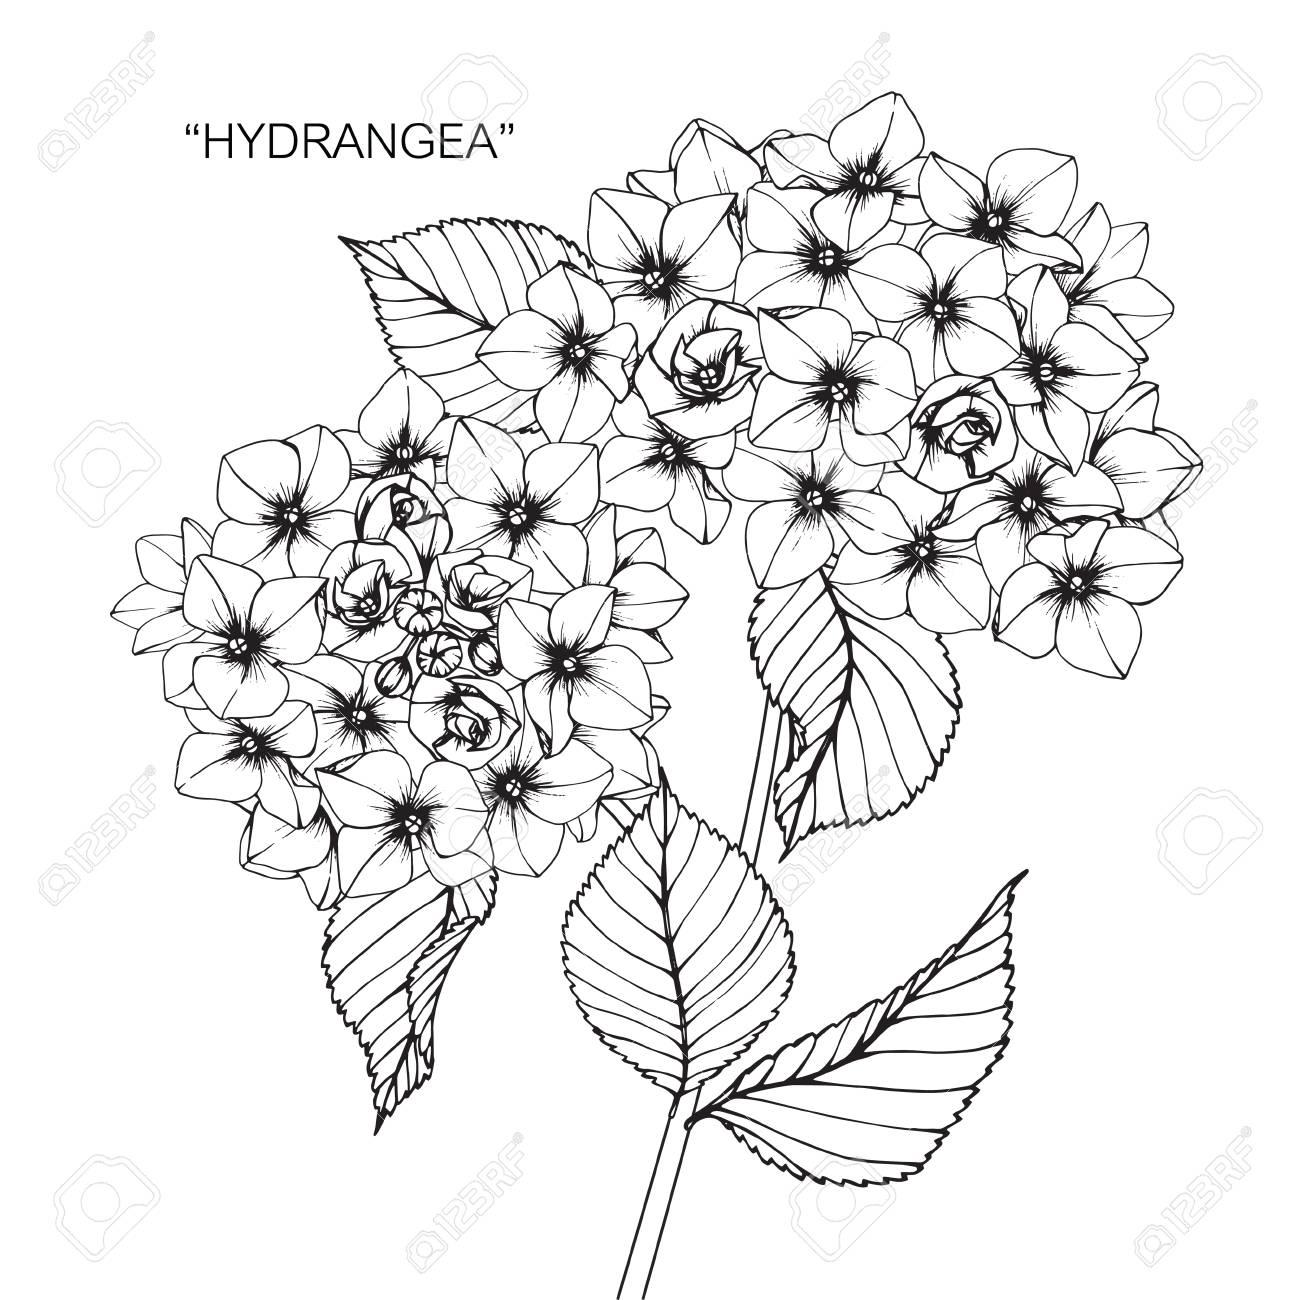 Hydrangea flower drawing and sketch with black and white line art hydrangea flower drawing and sketch with black and white line art stock vector mightylinksfo